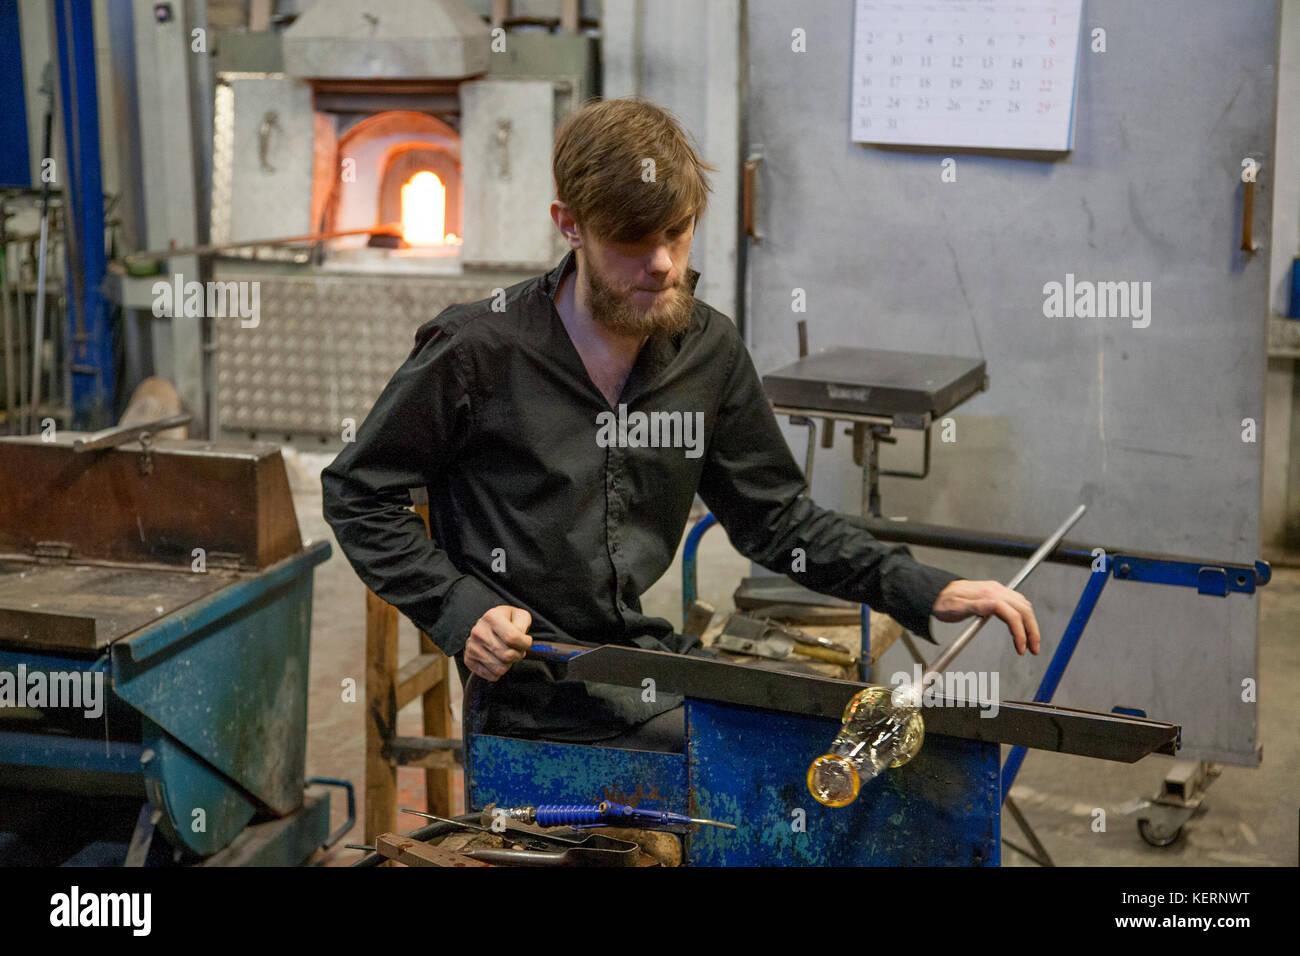 GLASS BLOWER at Reijmyre Glassworks at work 2017 - Stock Image